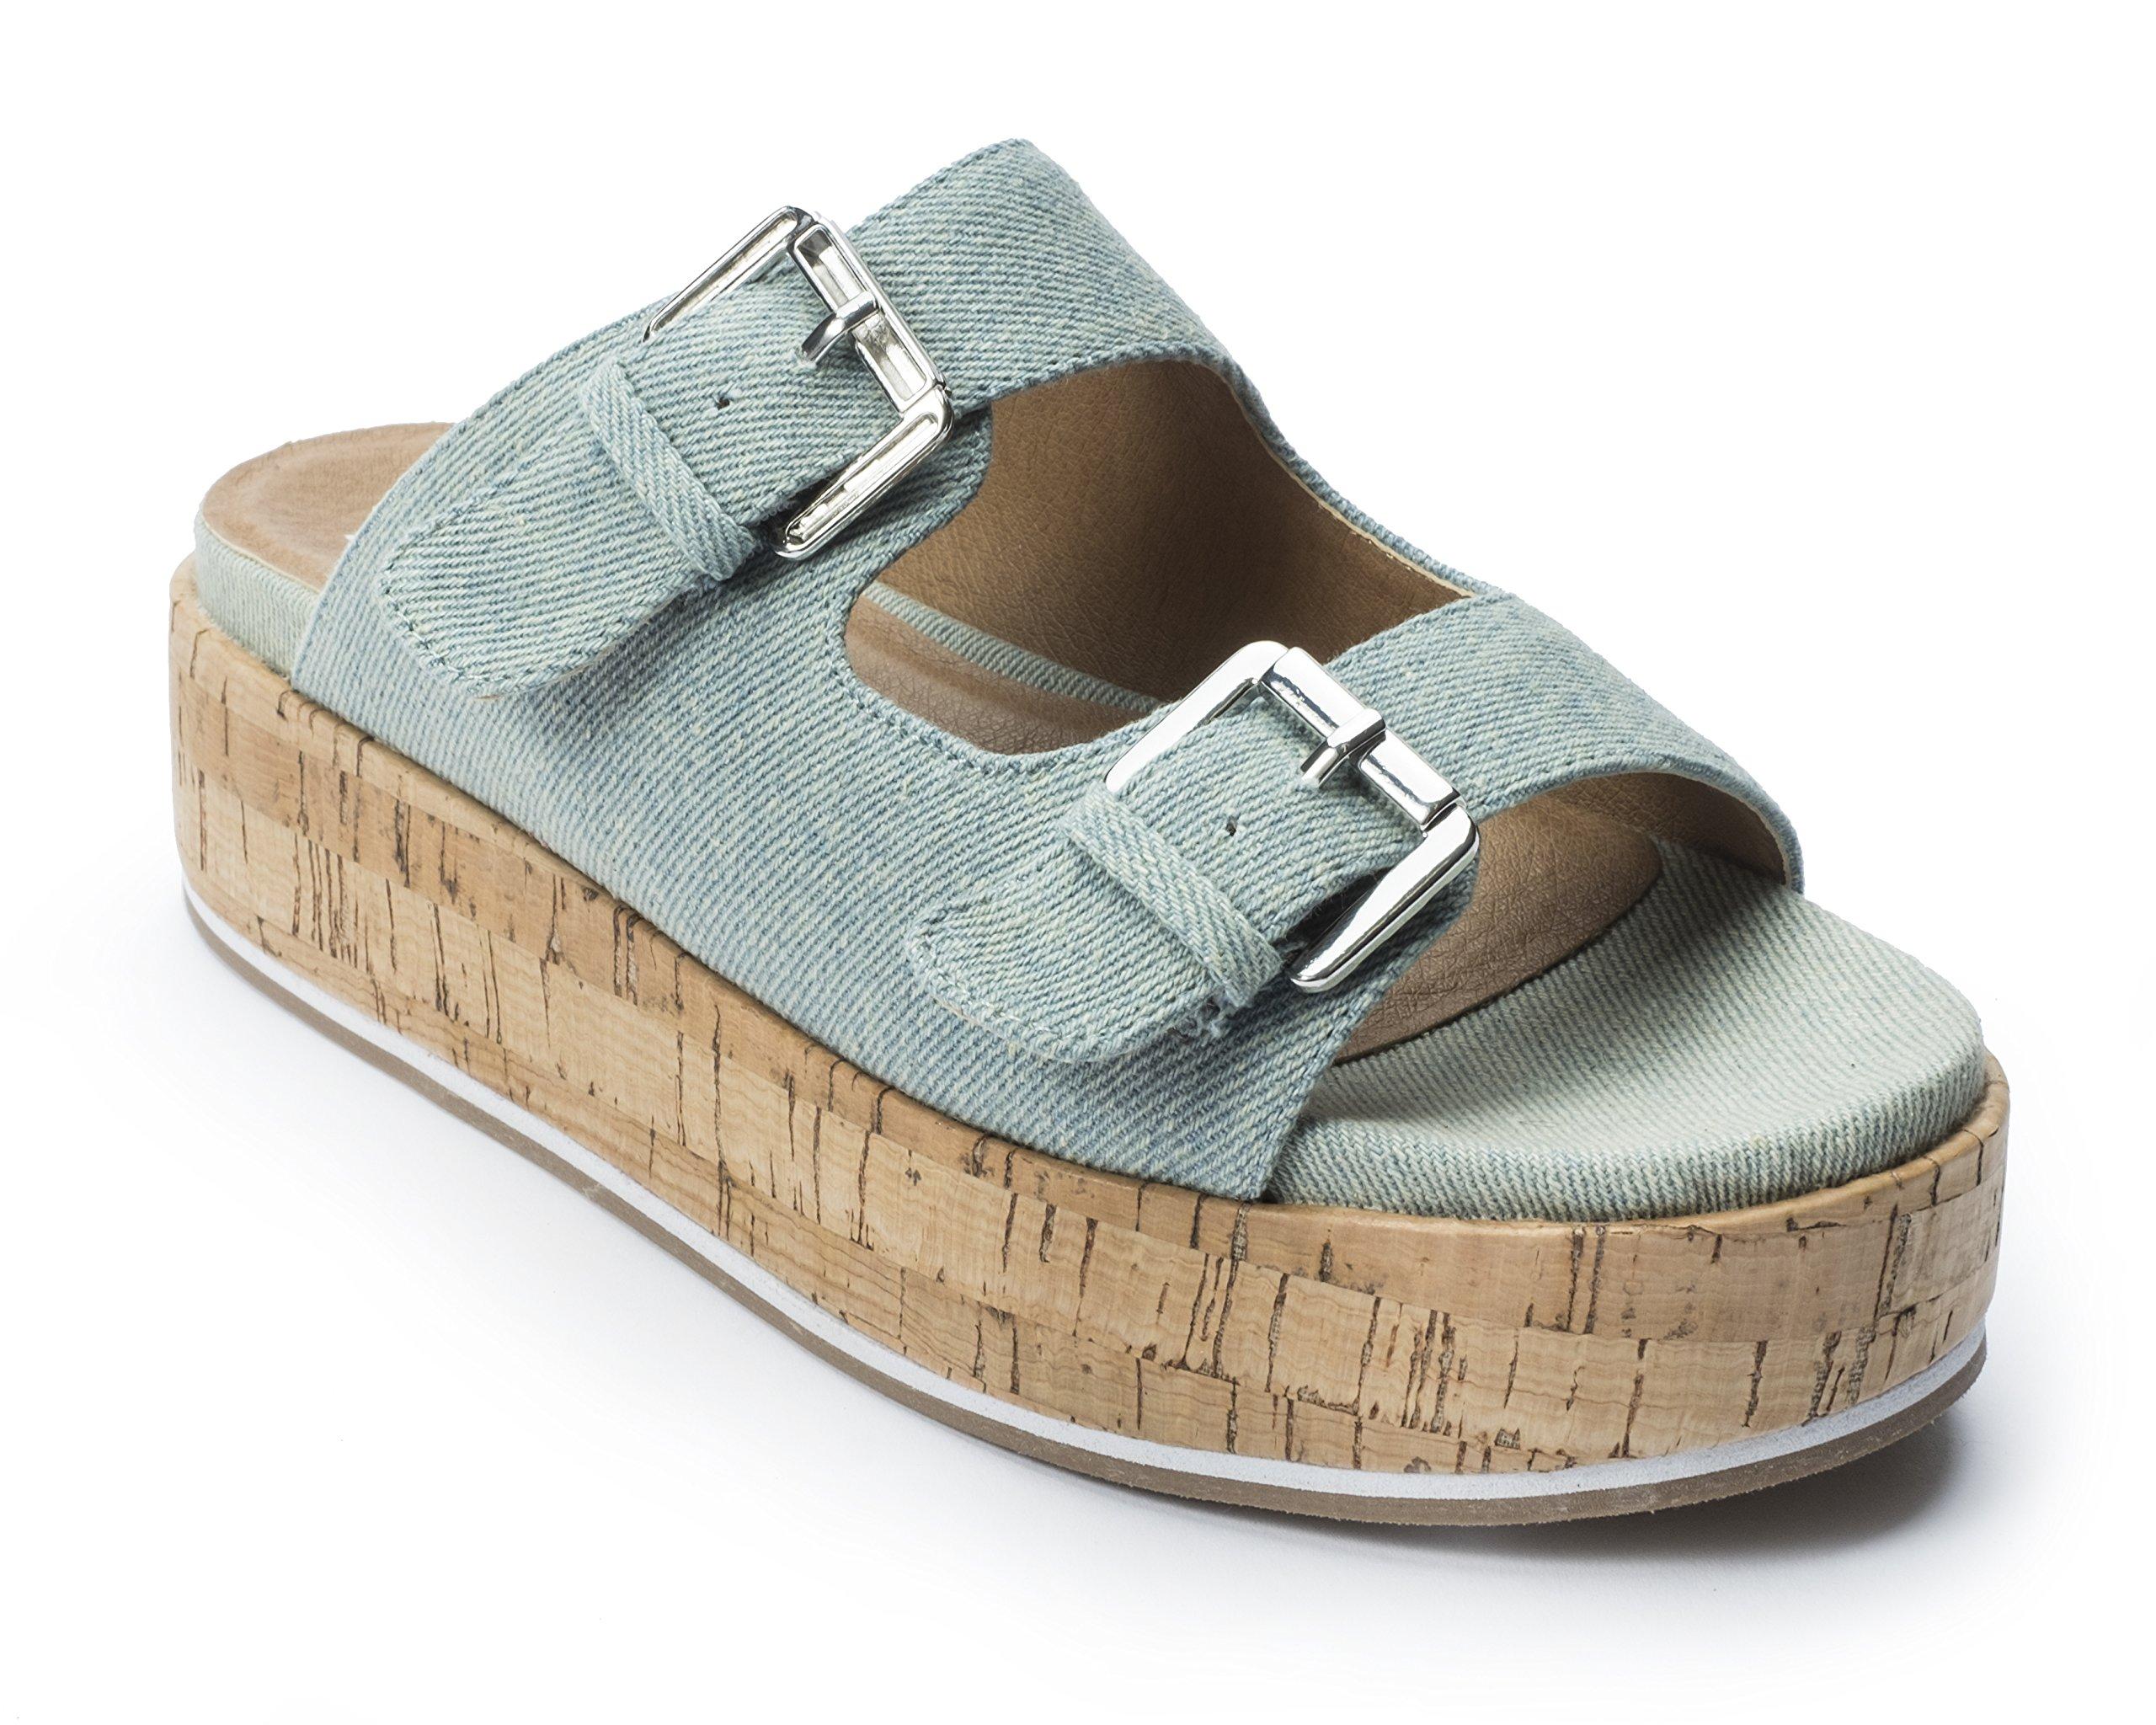 Jane and the Shoe Women's Jordan Light Blue 2 Buckle Platform Sandal Size 10